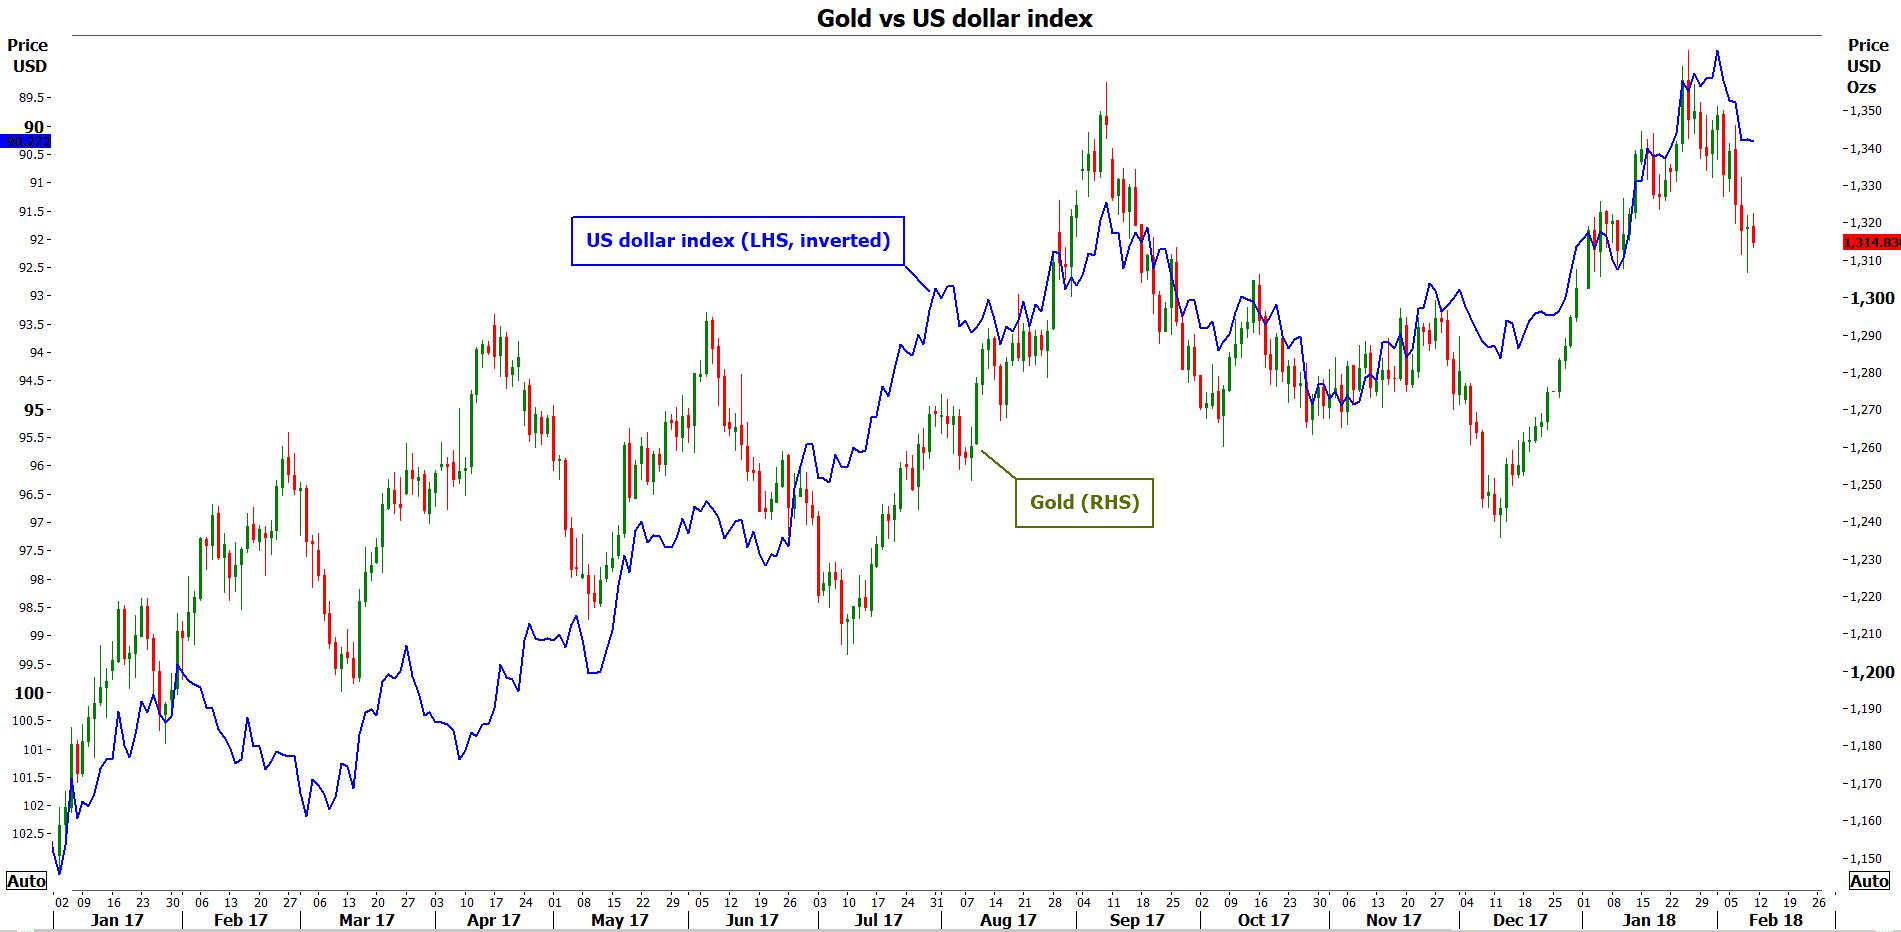 or vs dollar index feb 2018